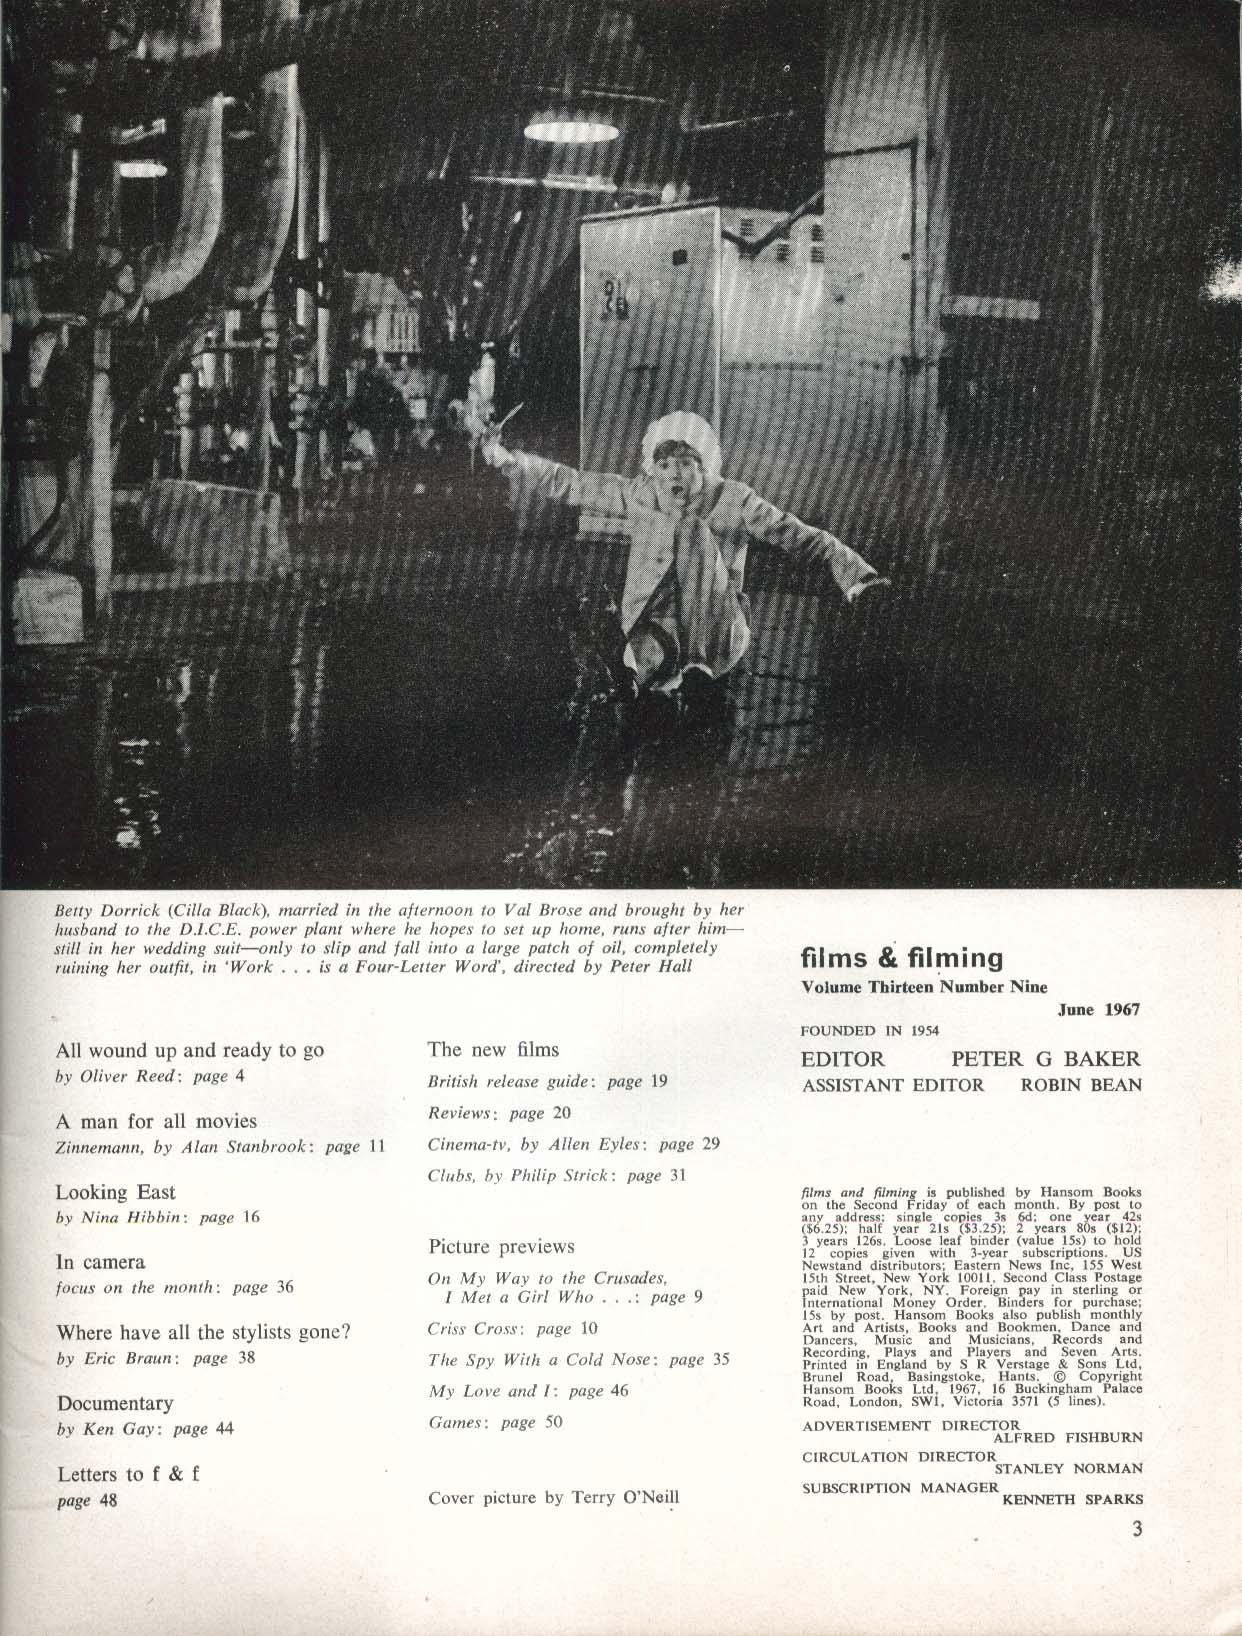 FILMS & FILMING Paul Jones Jean Shrimpton Oliver Reed Fred Zinnemann 6 1967